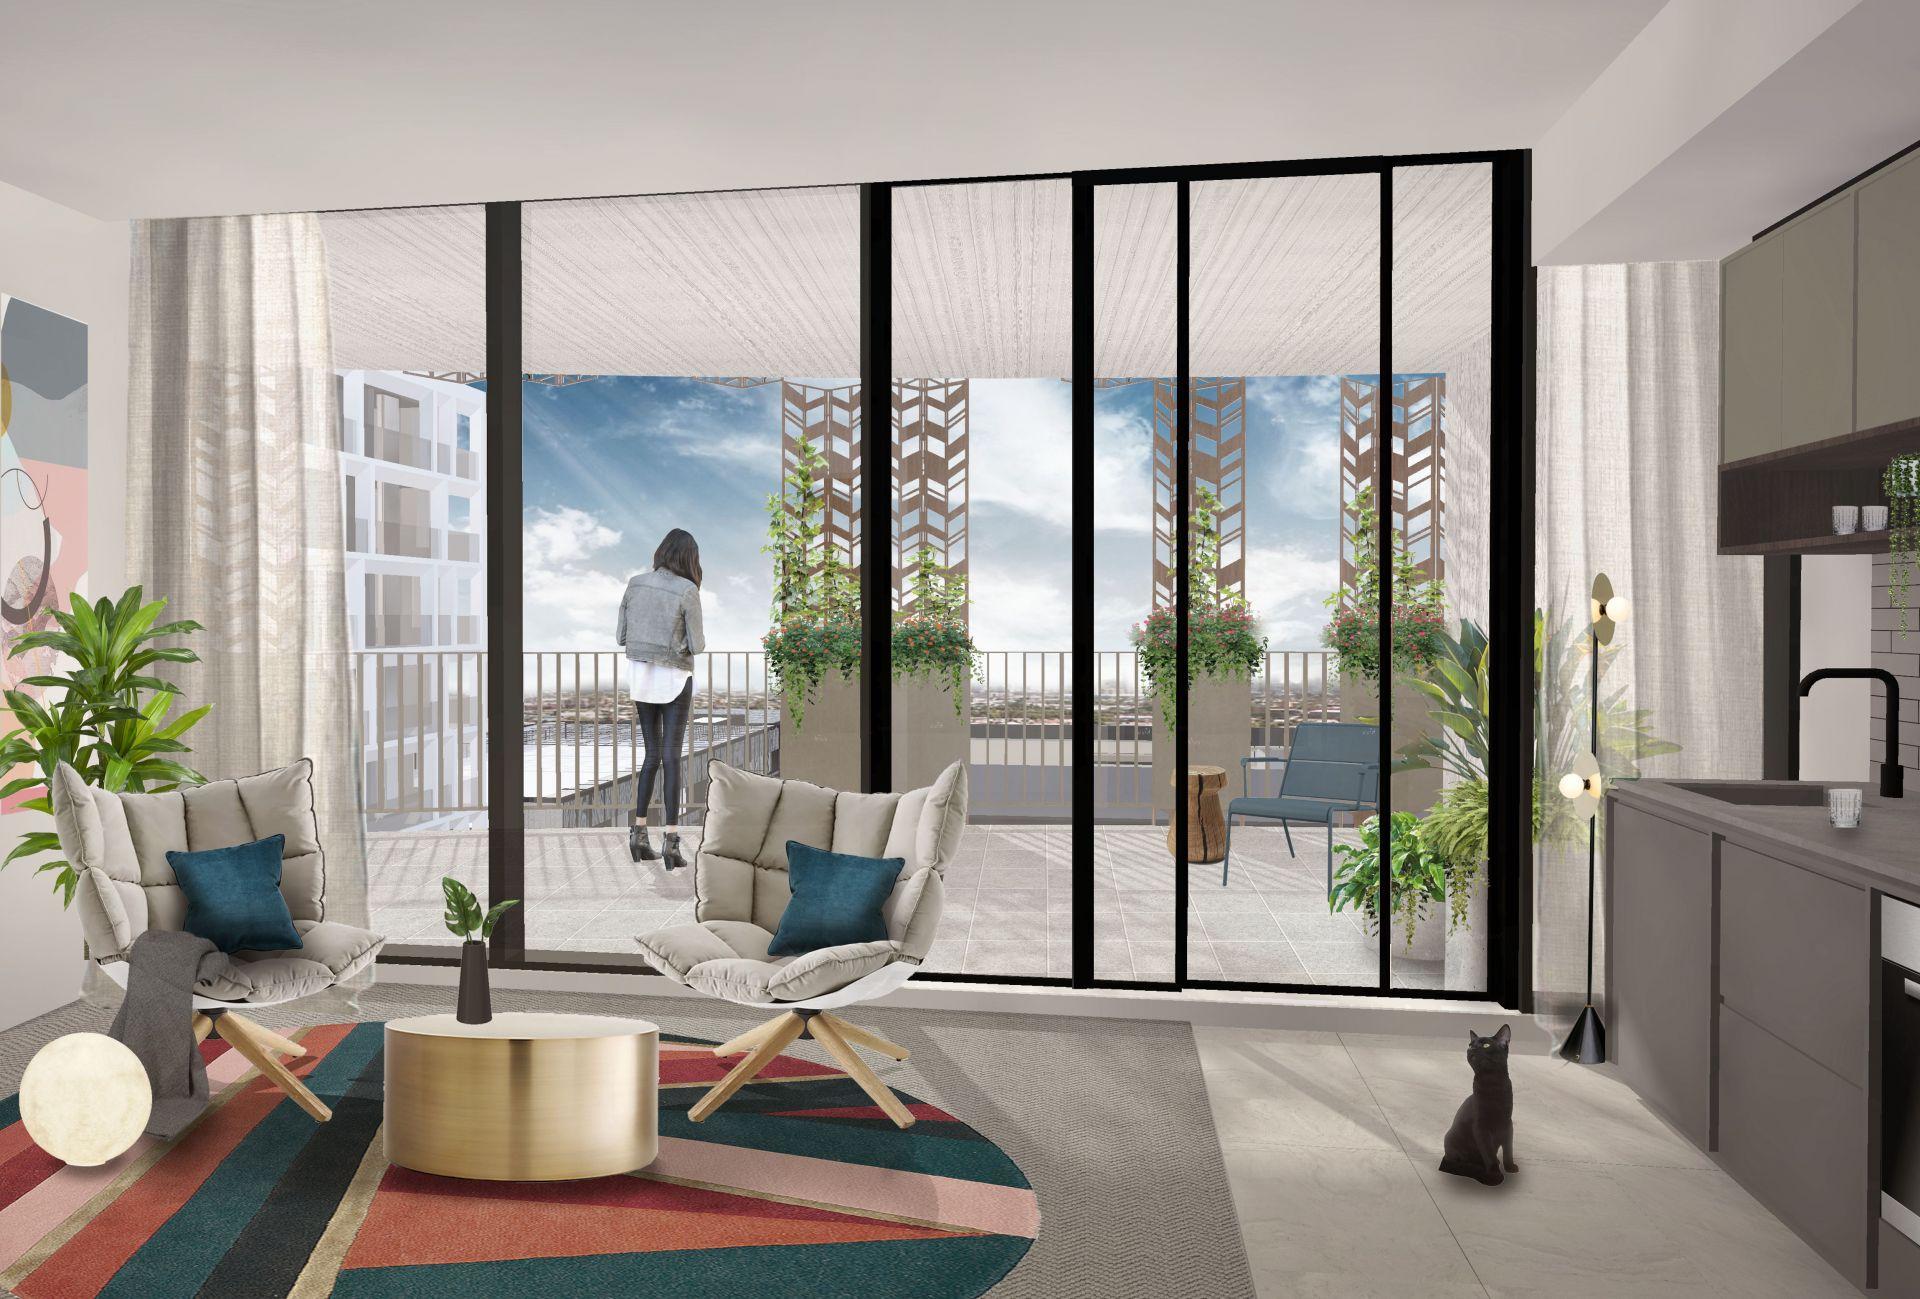 Living matrix apartment internal